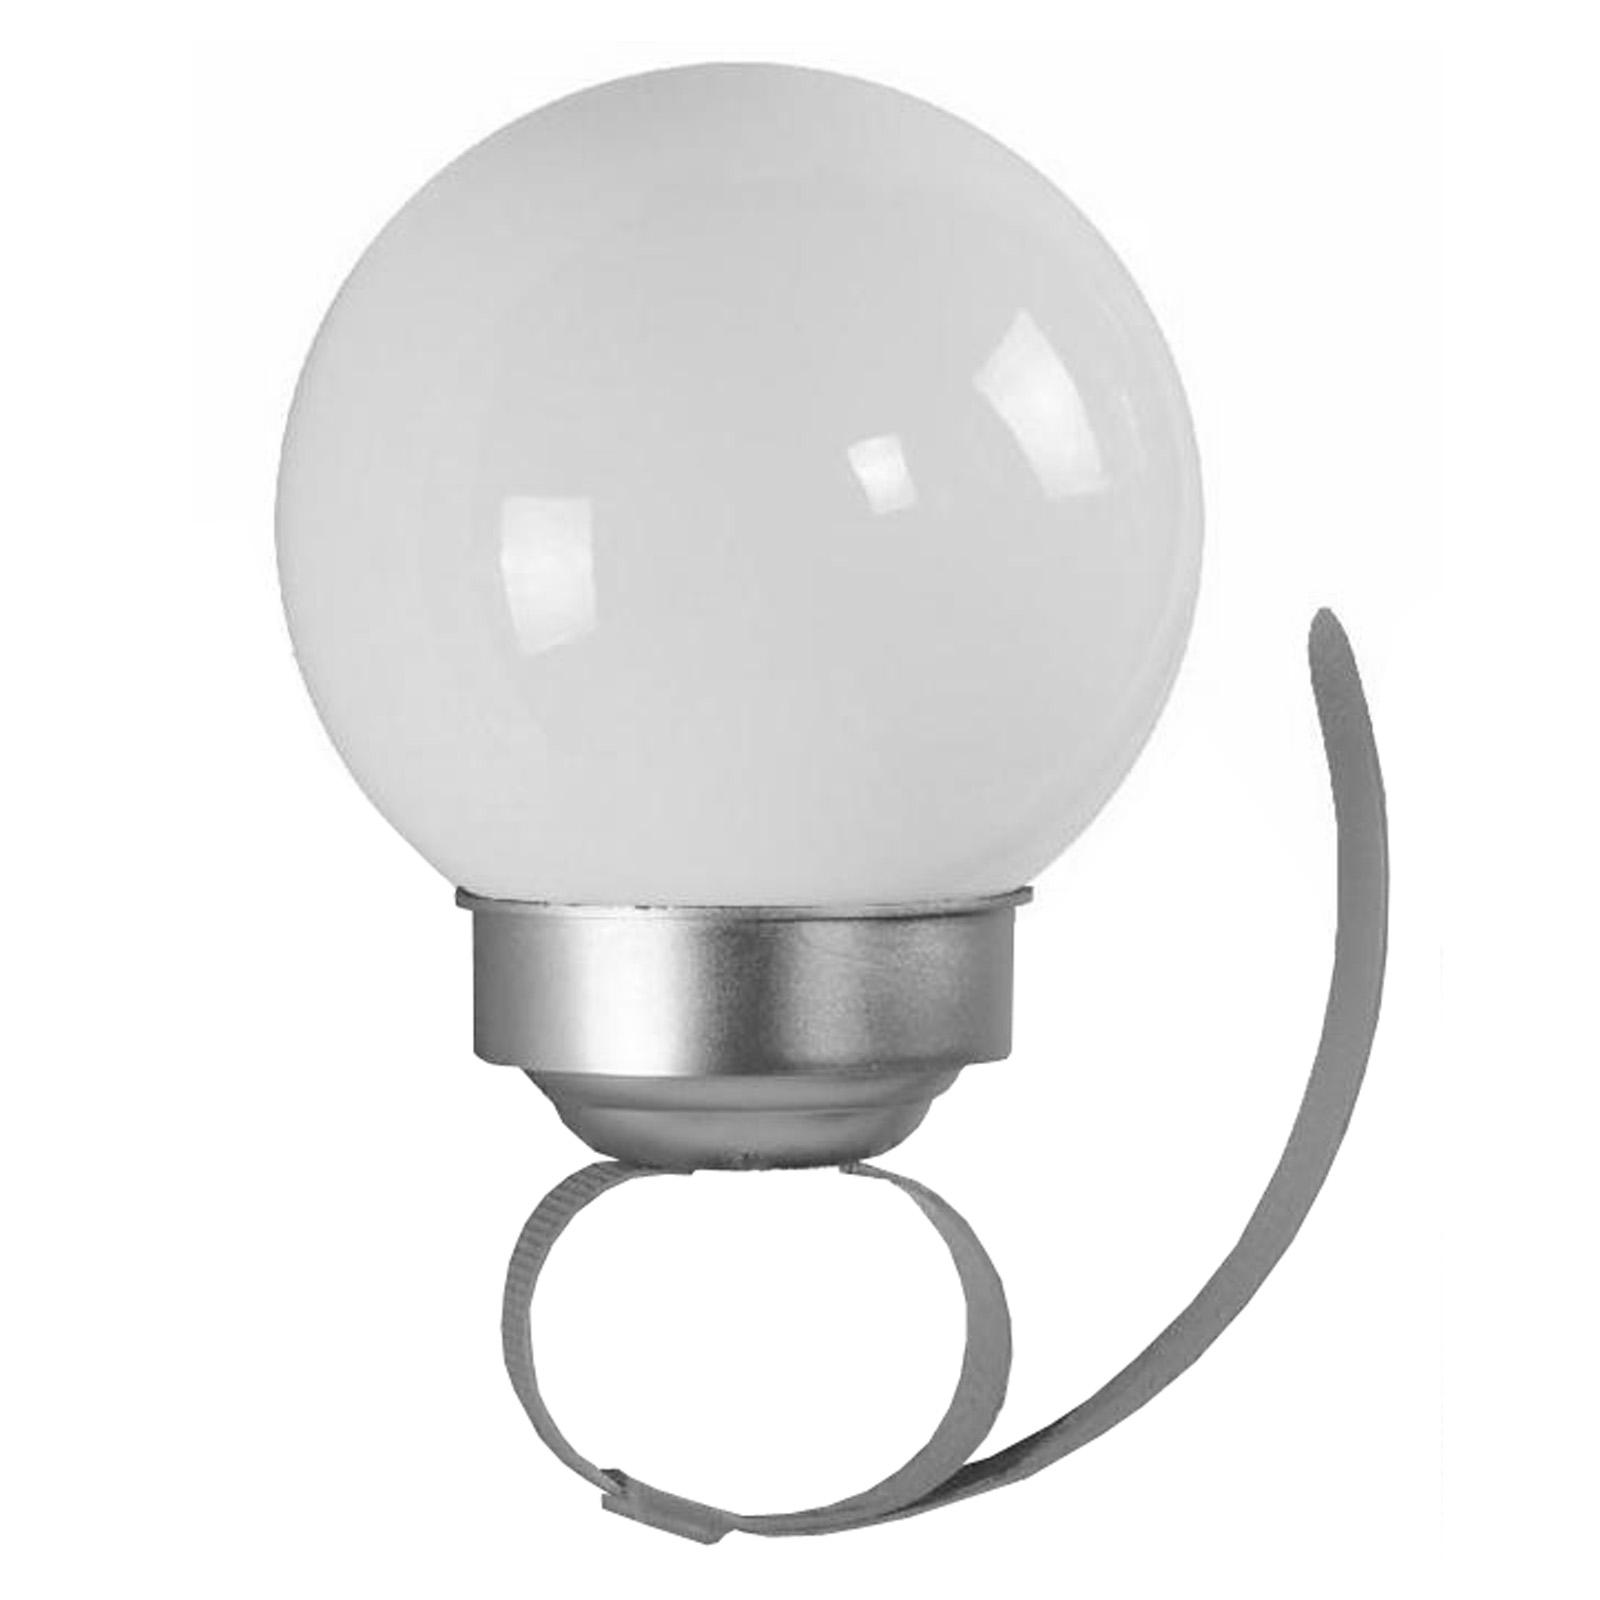 LED Solarleuchte Balkon Solarlampe Kugel Geländer Solar Lampe Balkongeländer